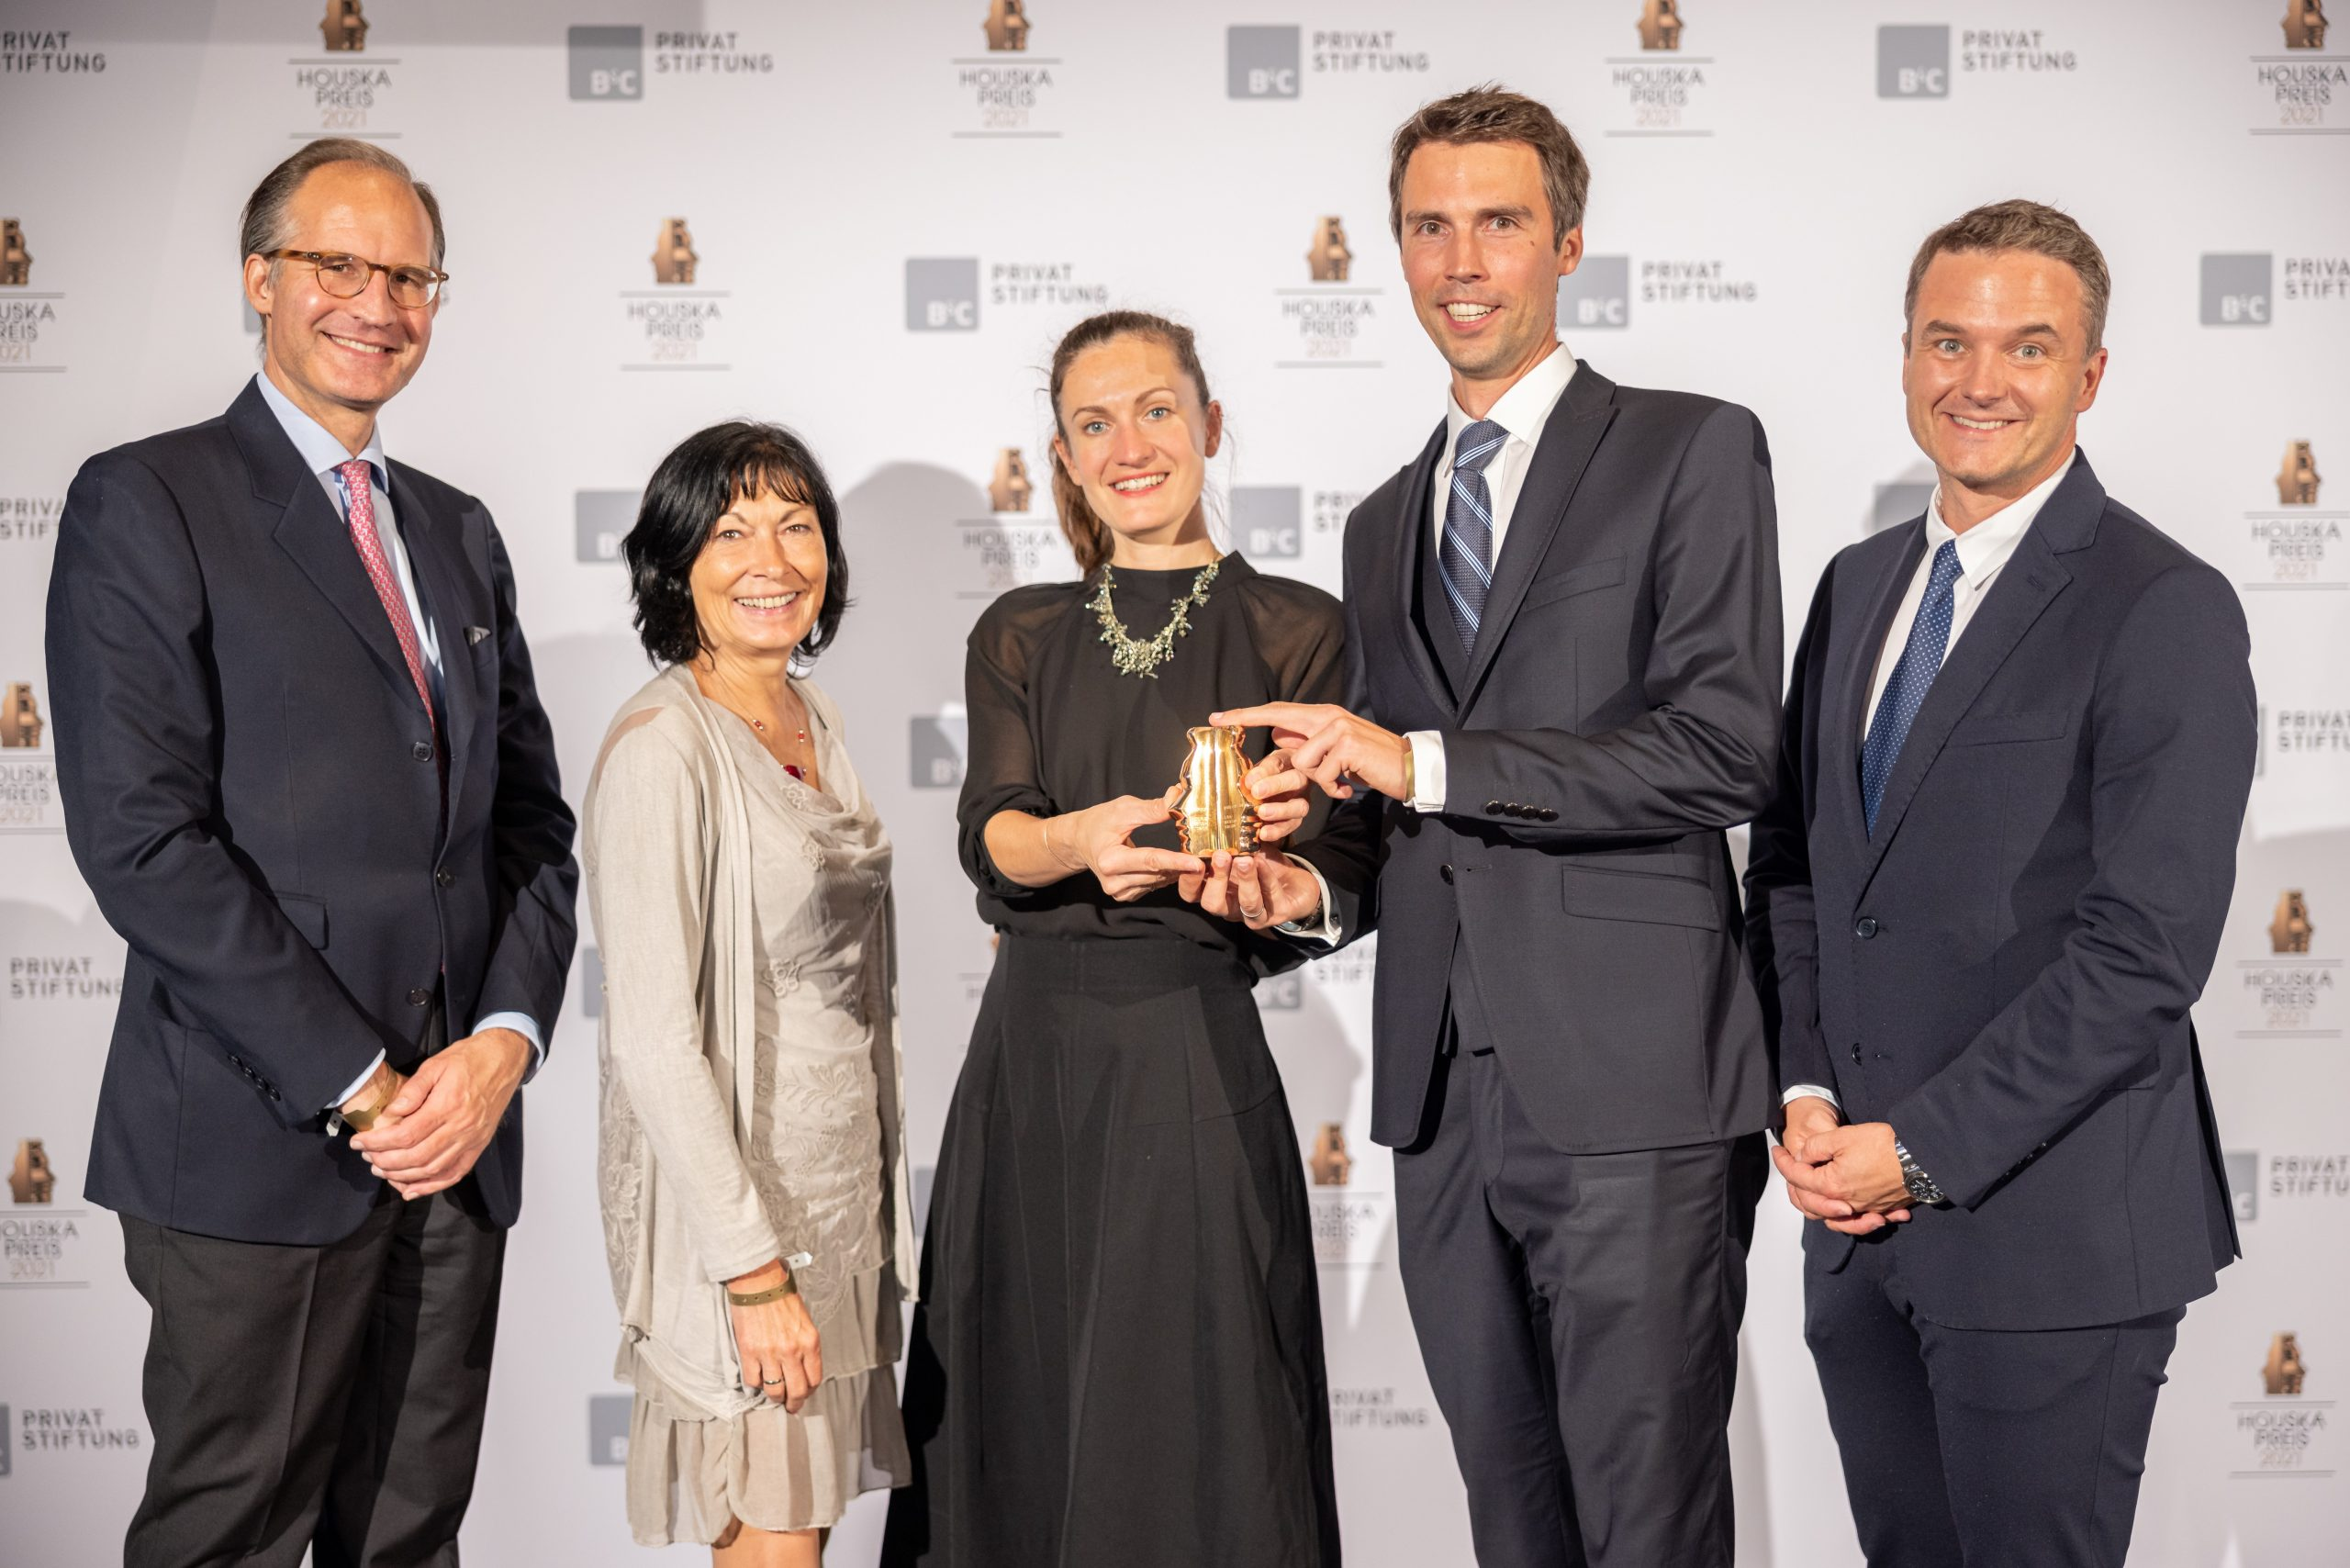 3. Platz Houskapreis 2021 für BOKU Wien